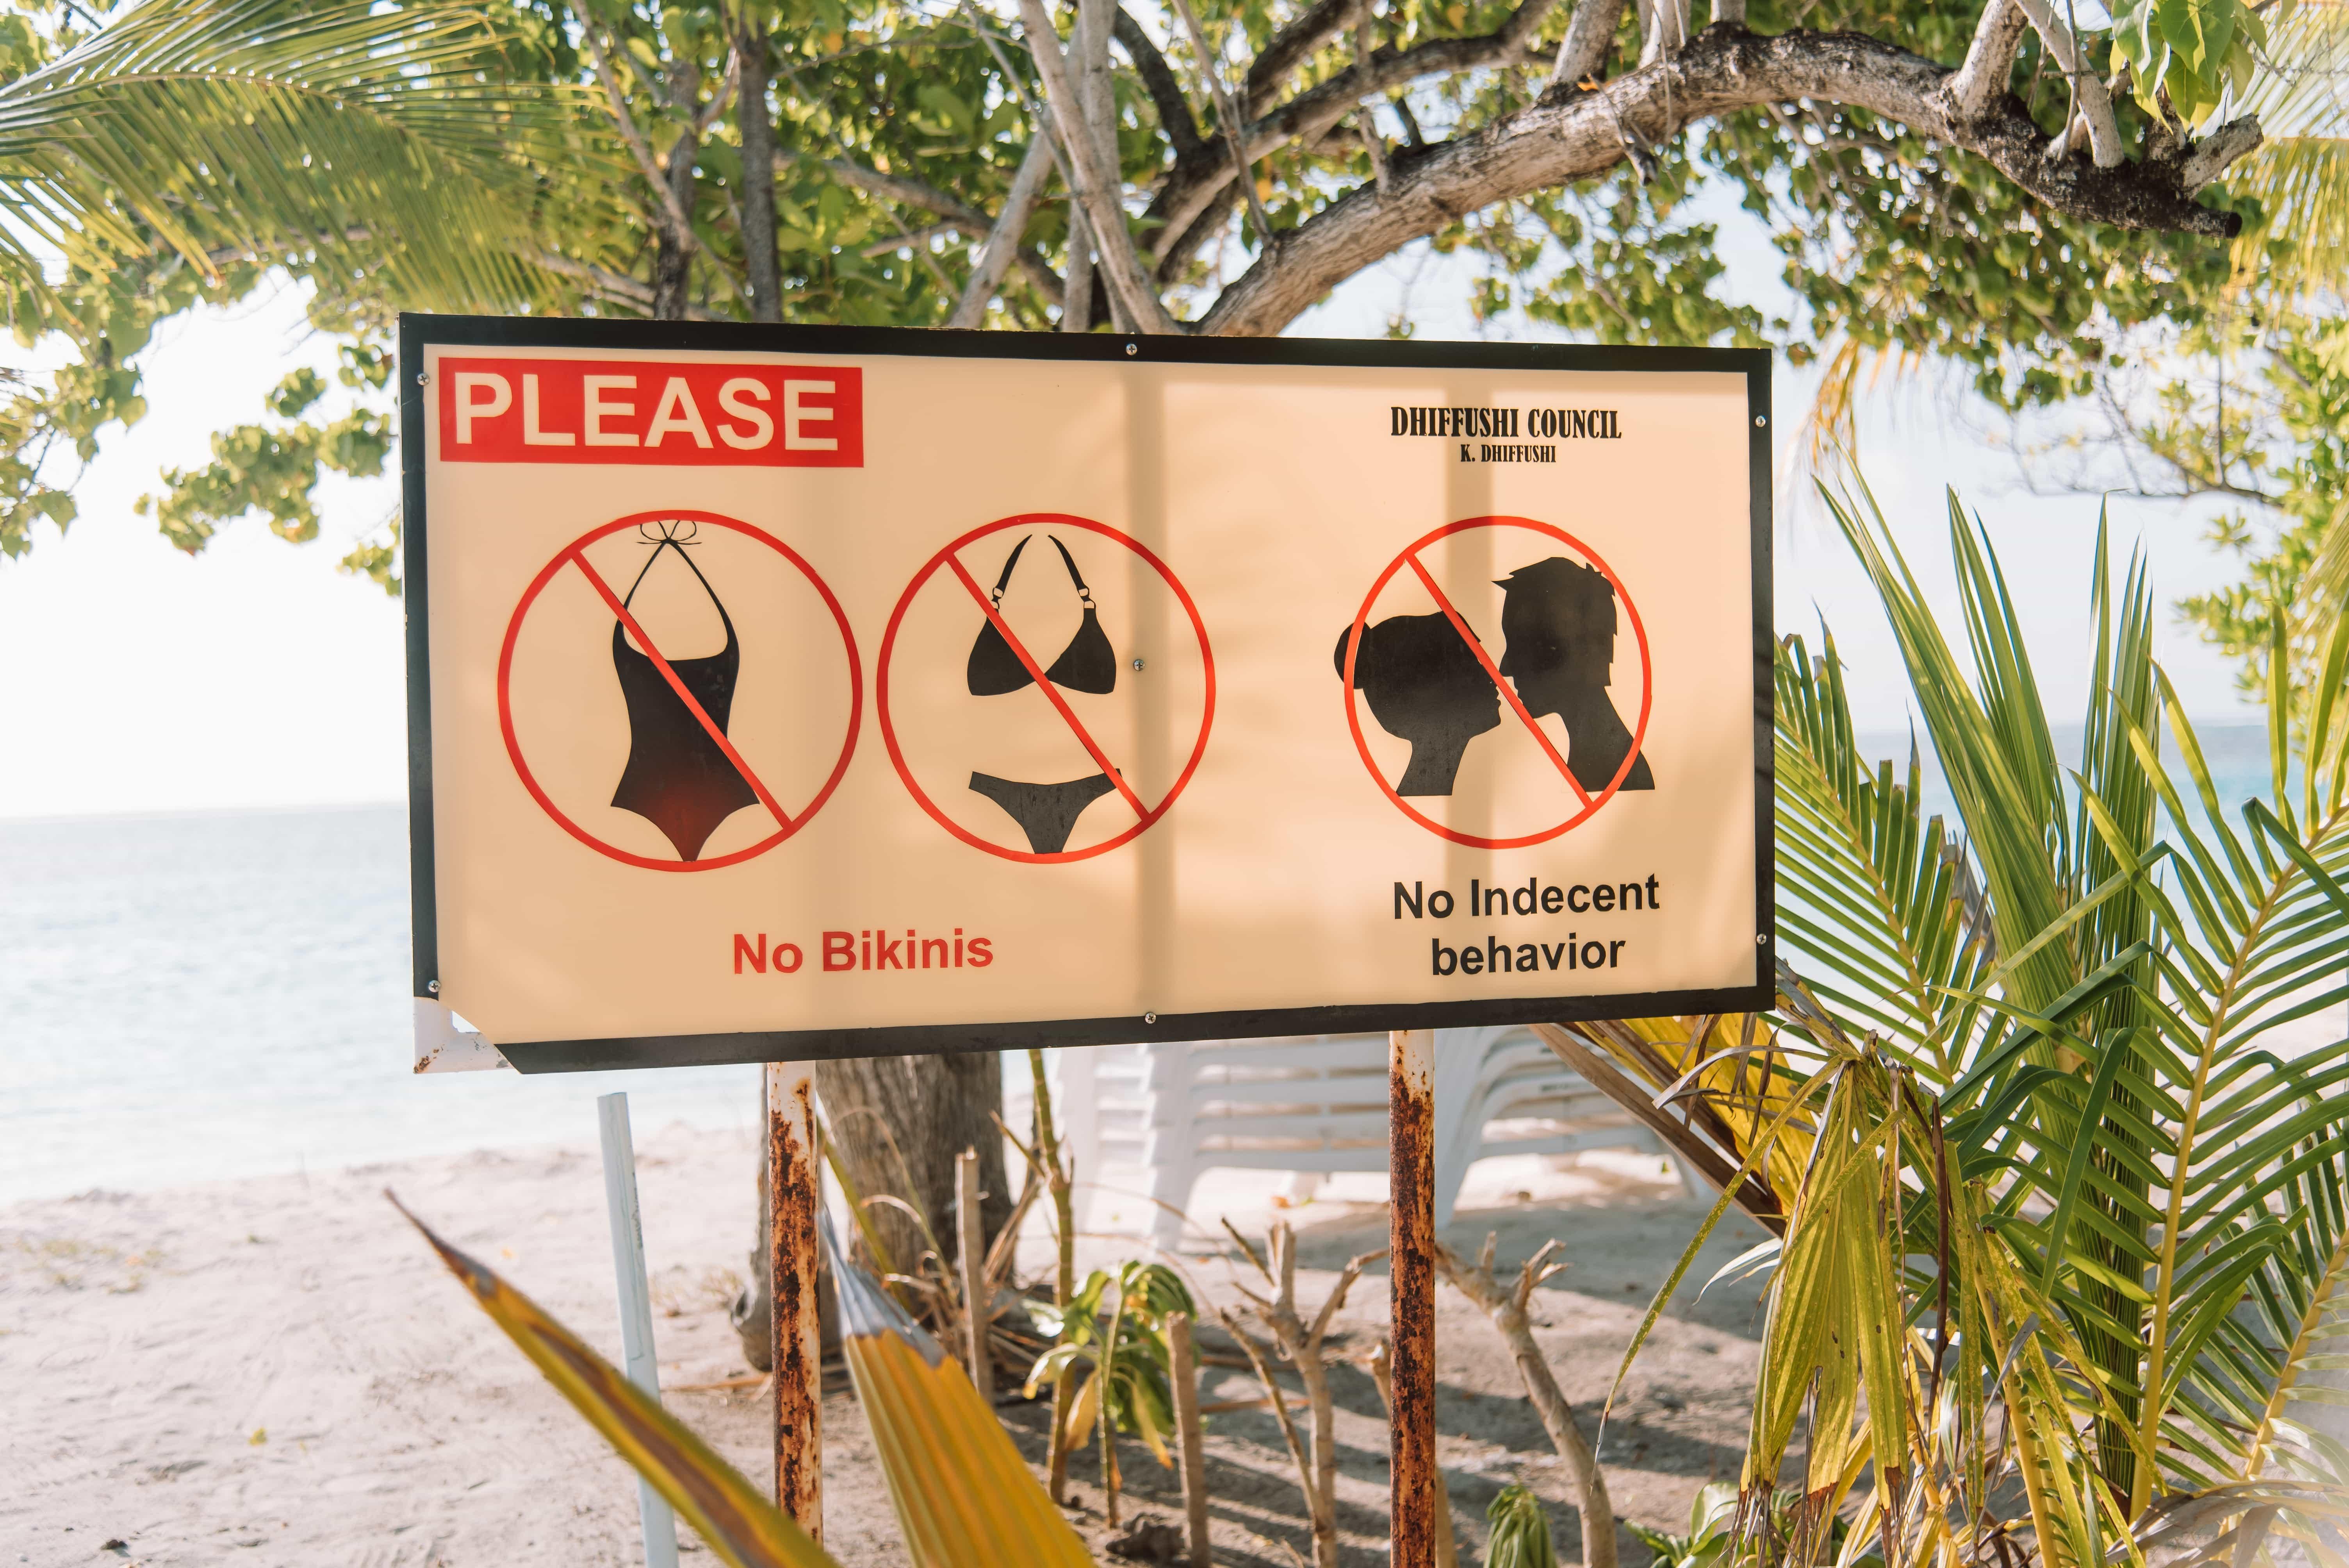 Luxury resorts vs local islands in Maldives, Dhiffushi travel guide, things to do in Dhiffushi, Dhifushi Island